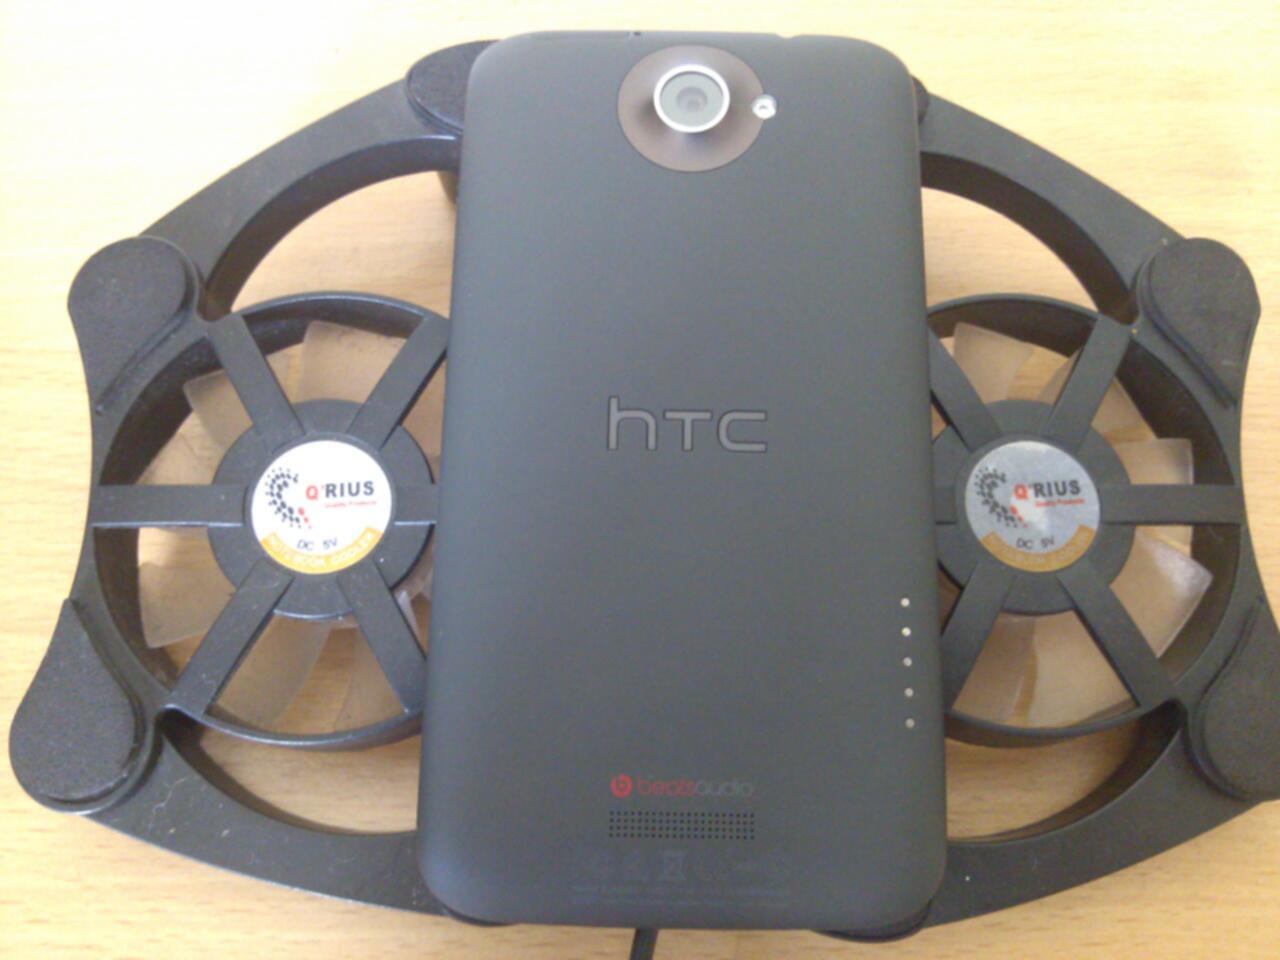 ANDROID HTC ONE X FULLSET MULUSS BARU 2 BULAN PAKAI